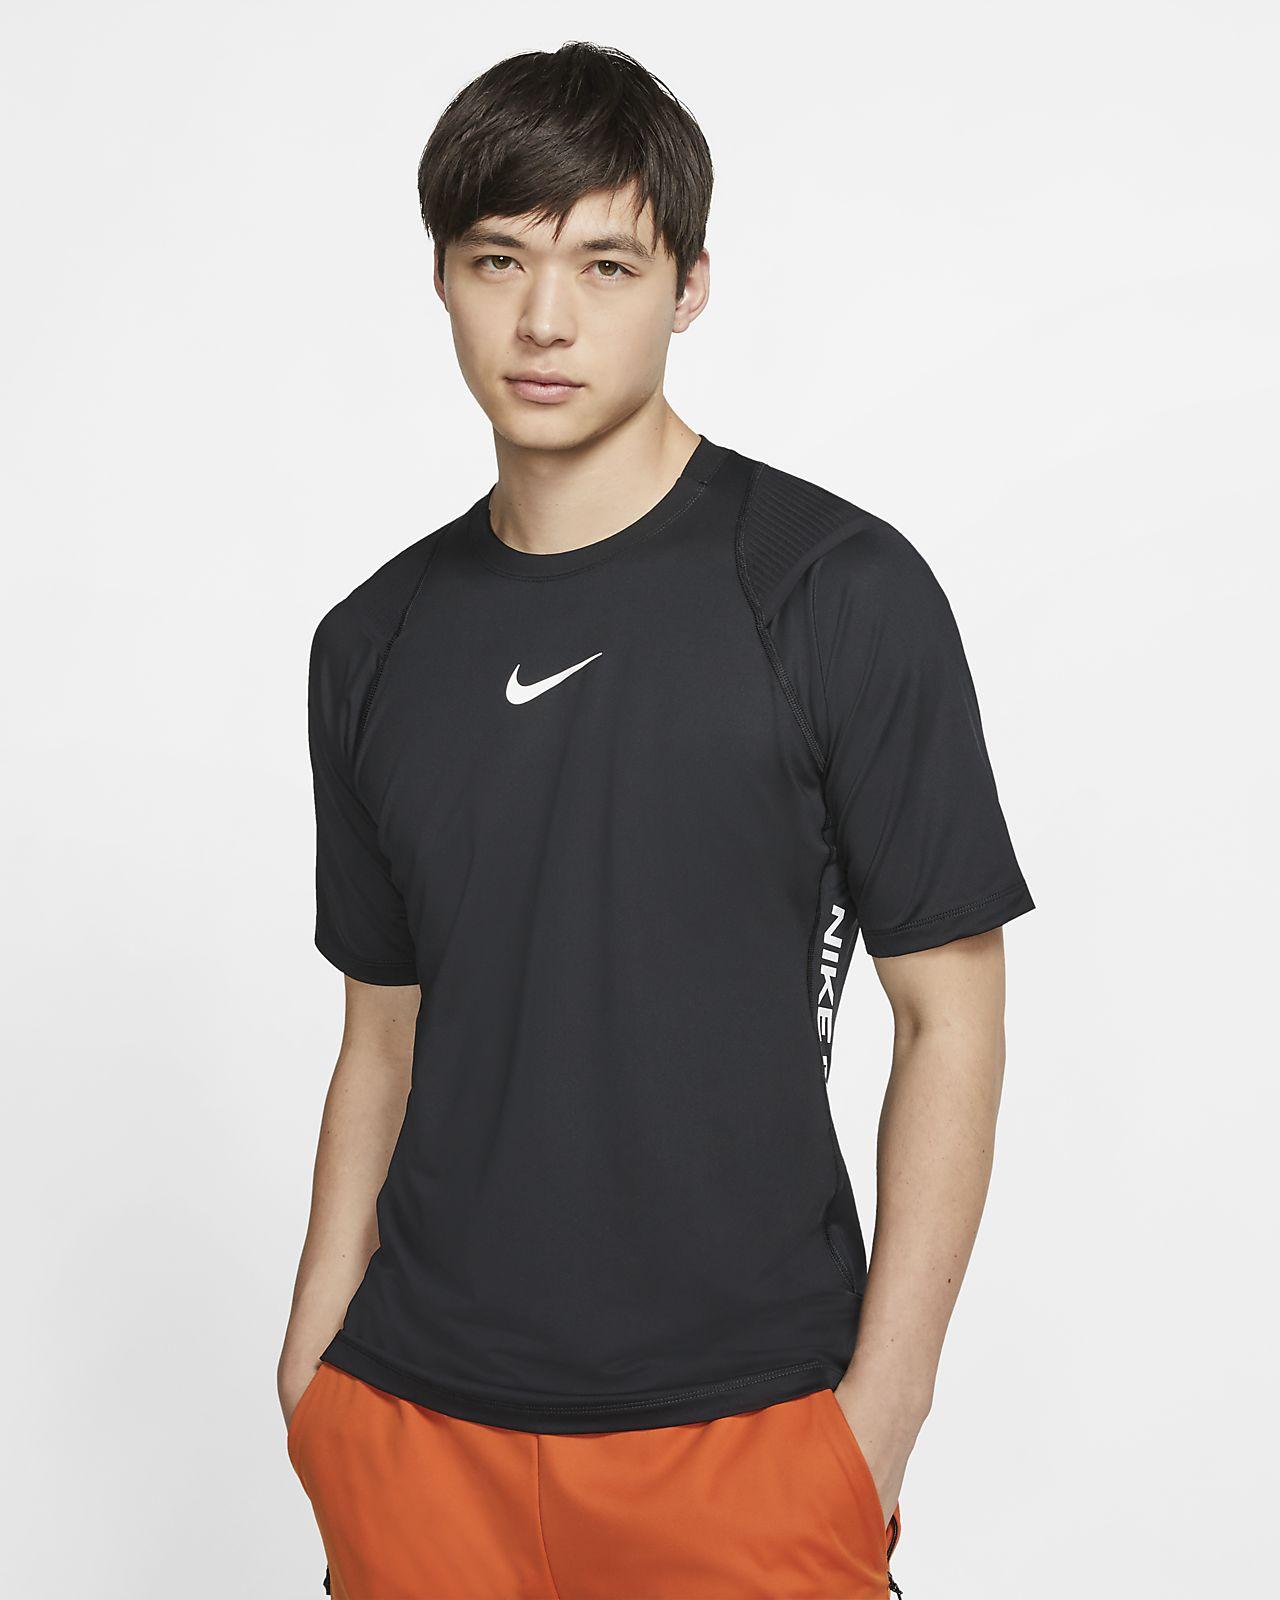 Nike Pro AeroAdapt Kurzarm-Oberteil für Herren